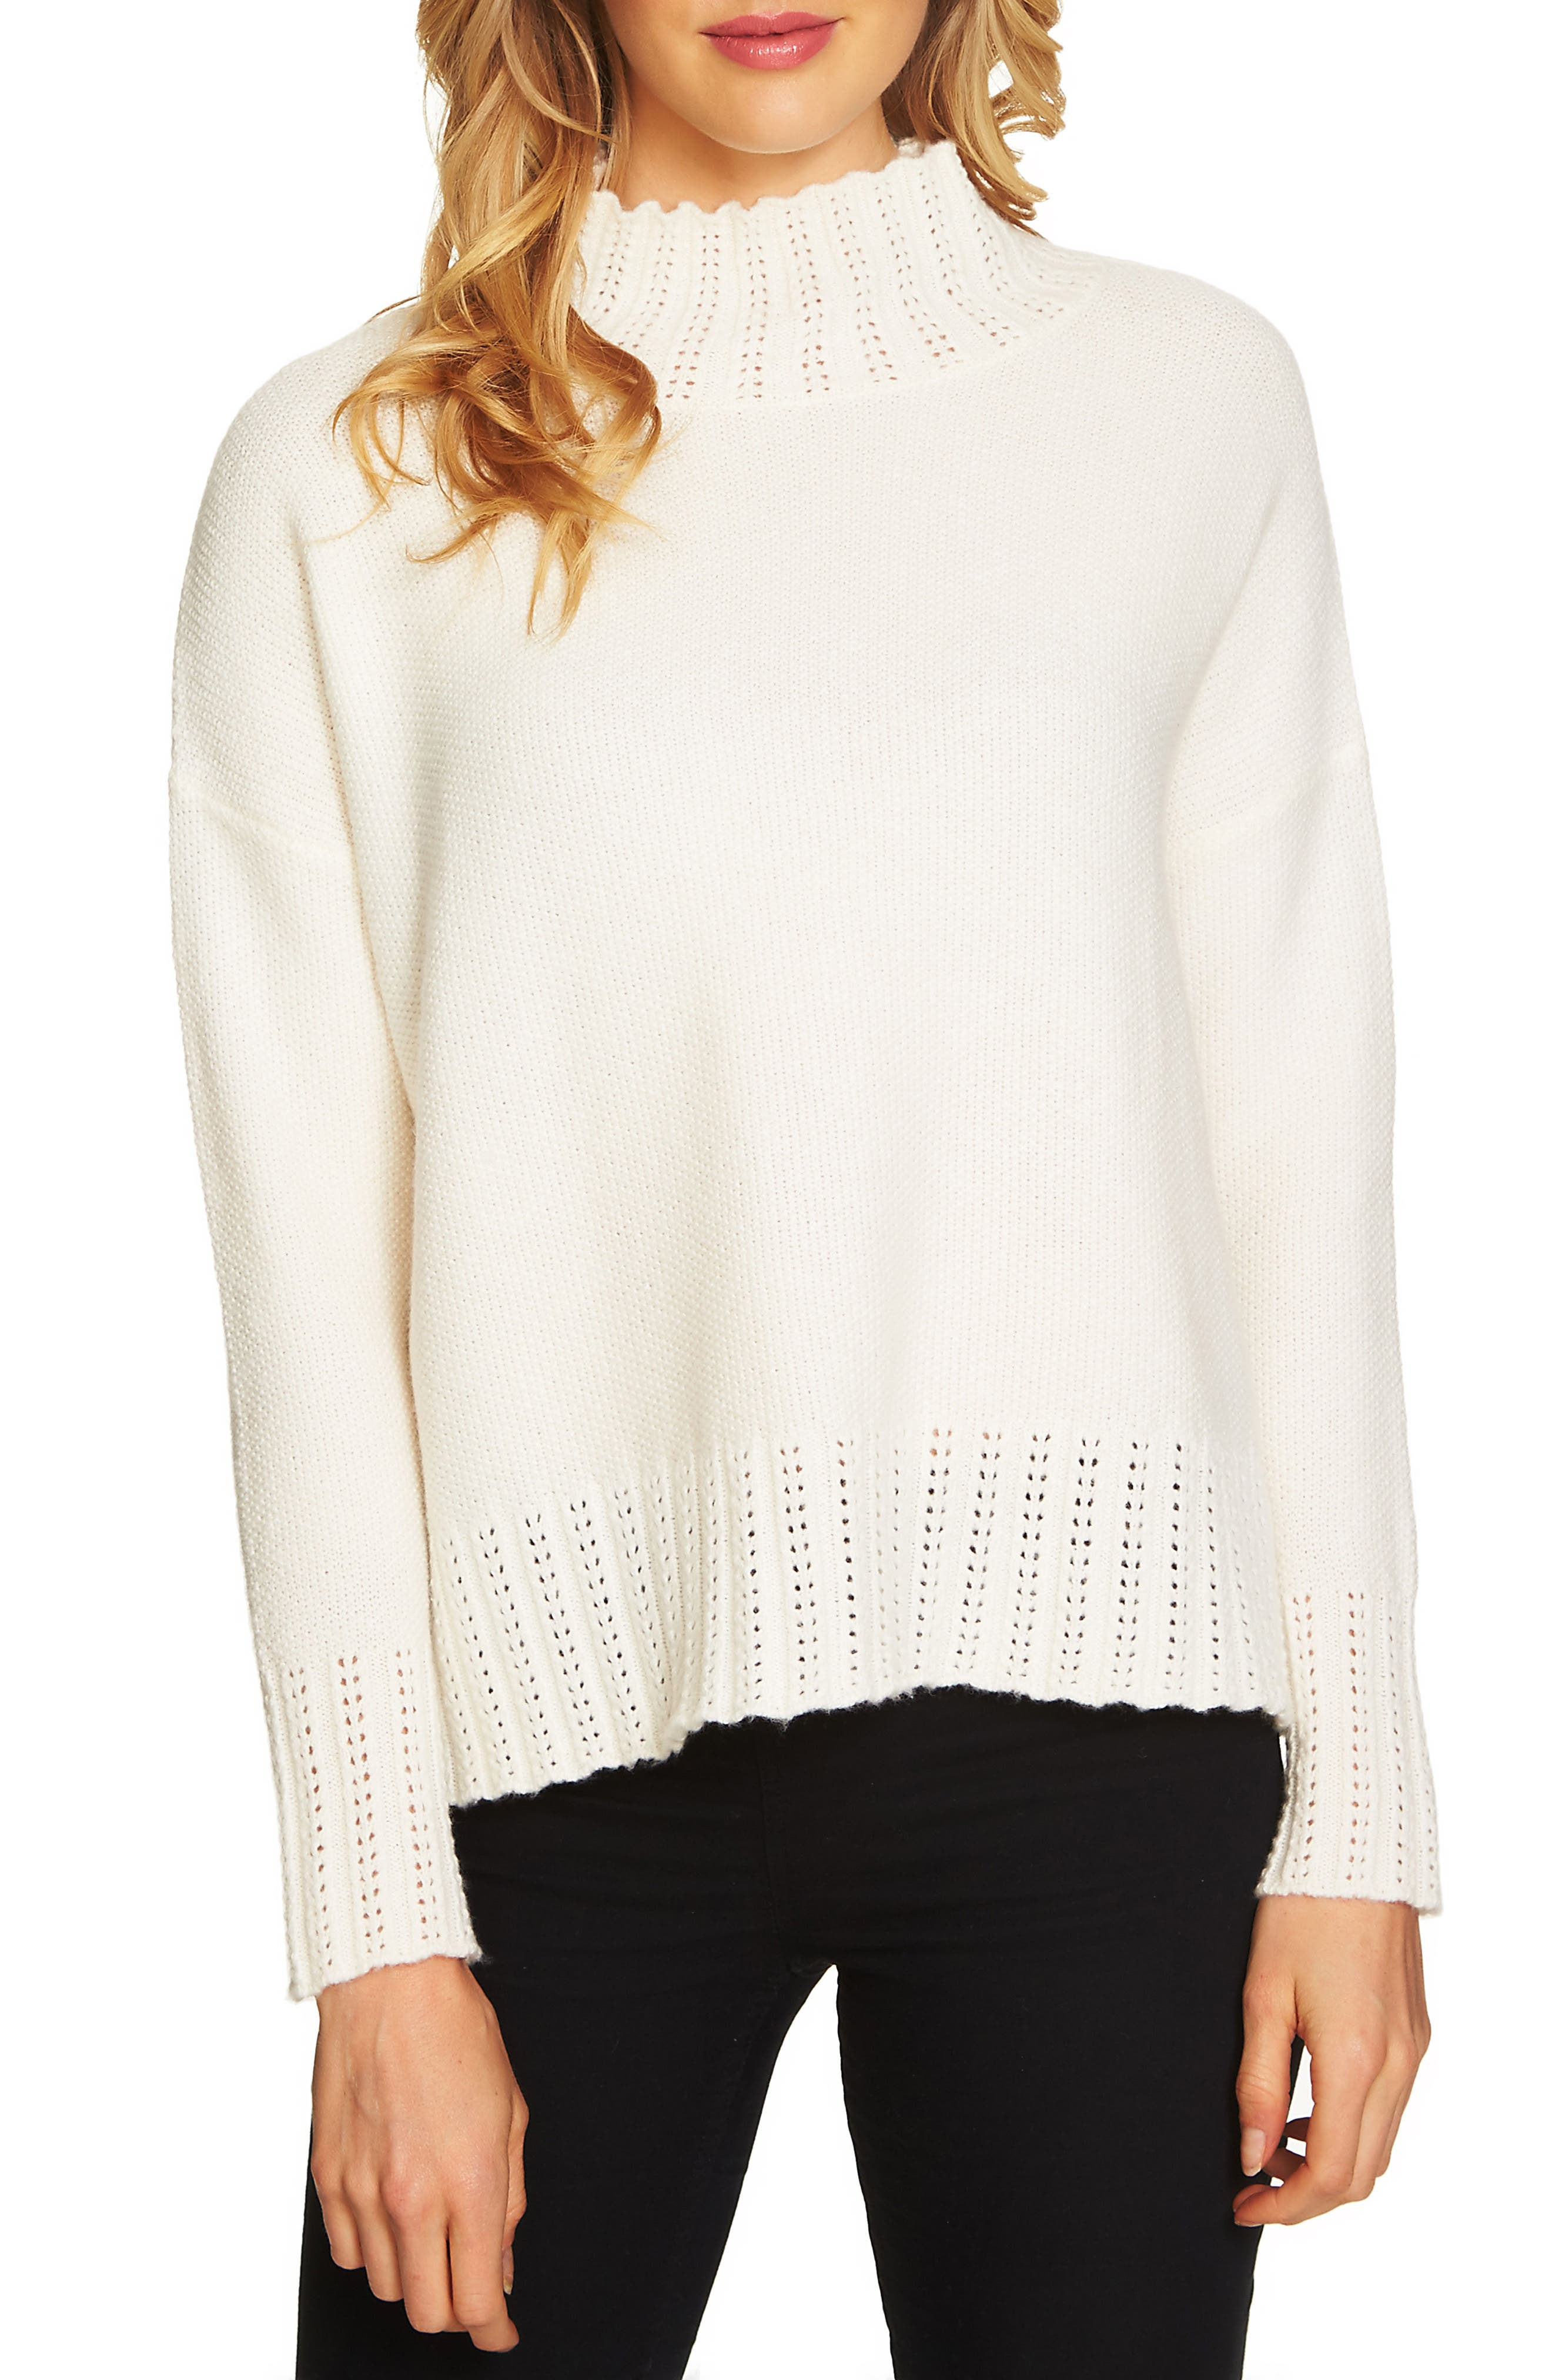 Main Image - Cece Seed Stitch Turtleneck Sweater